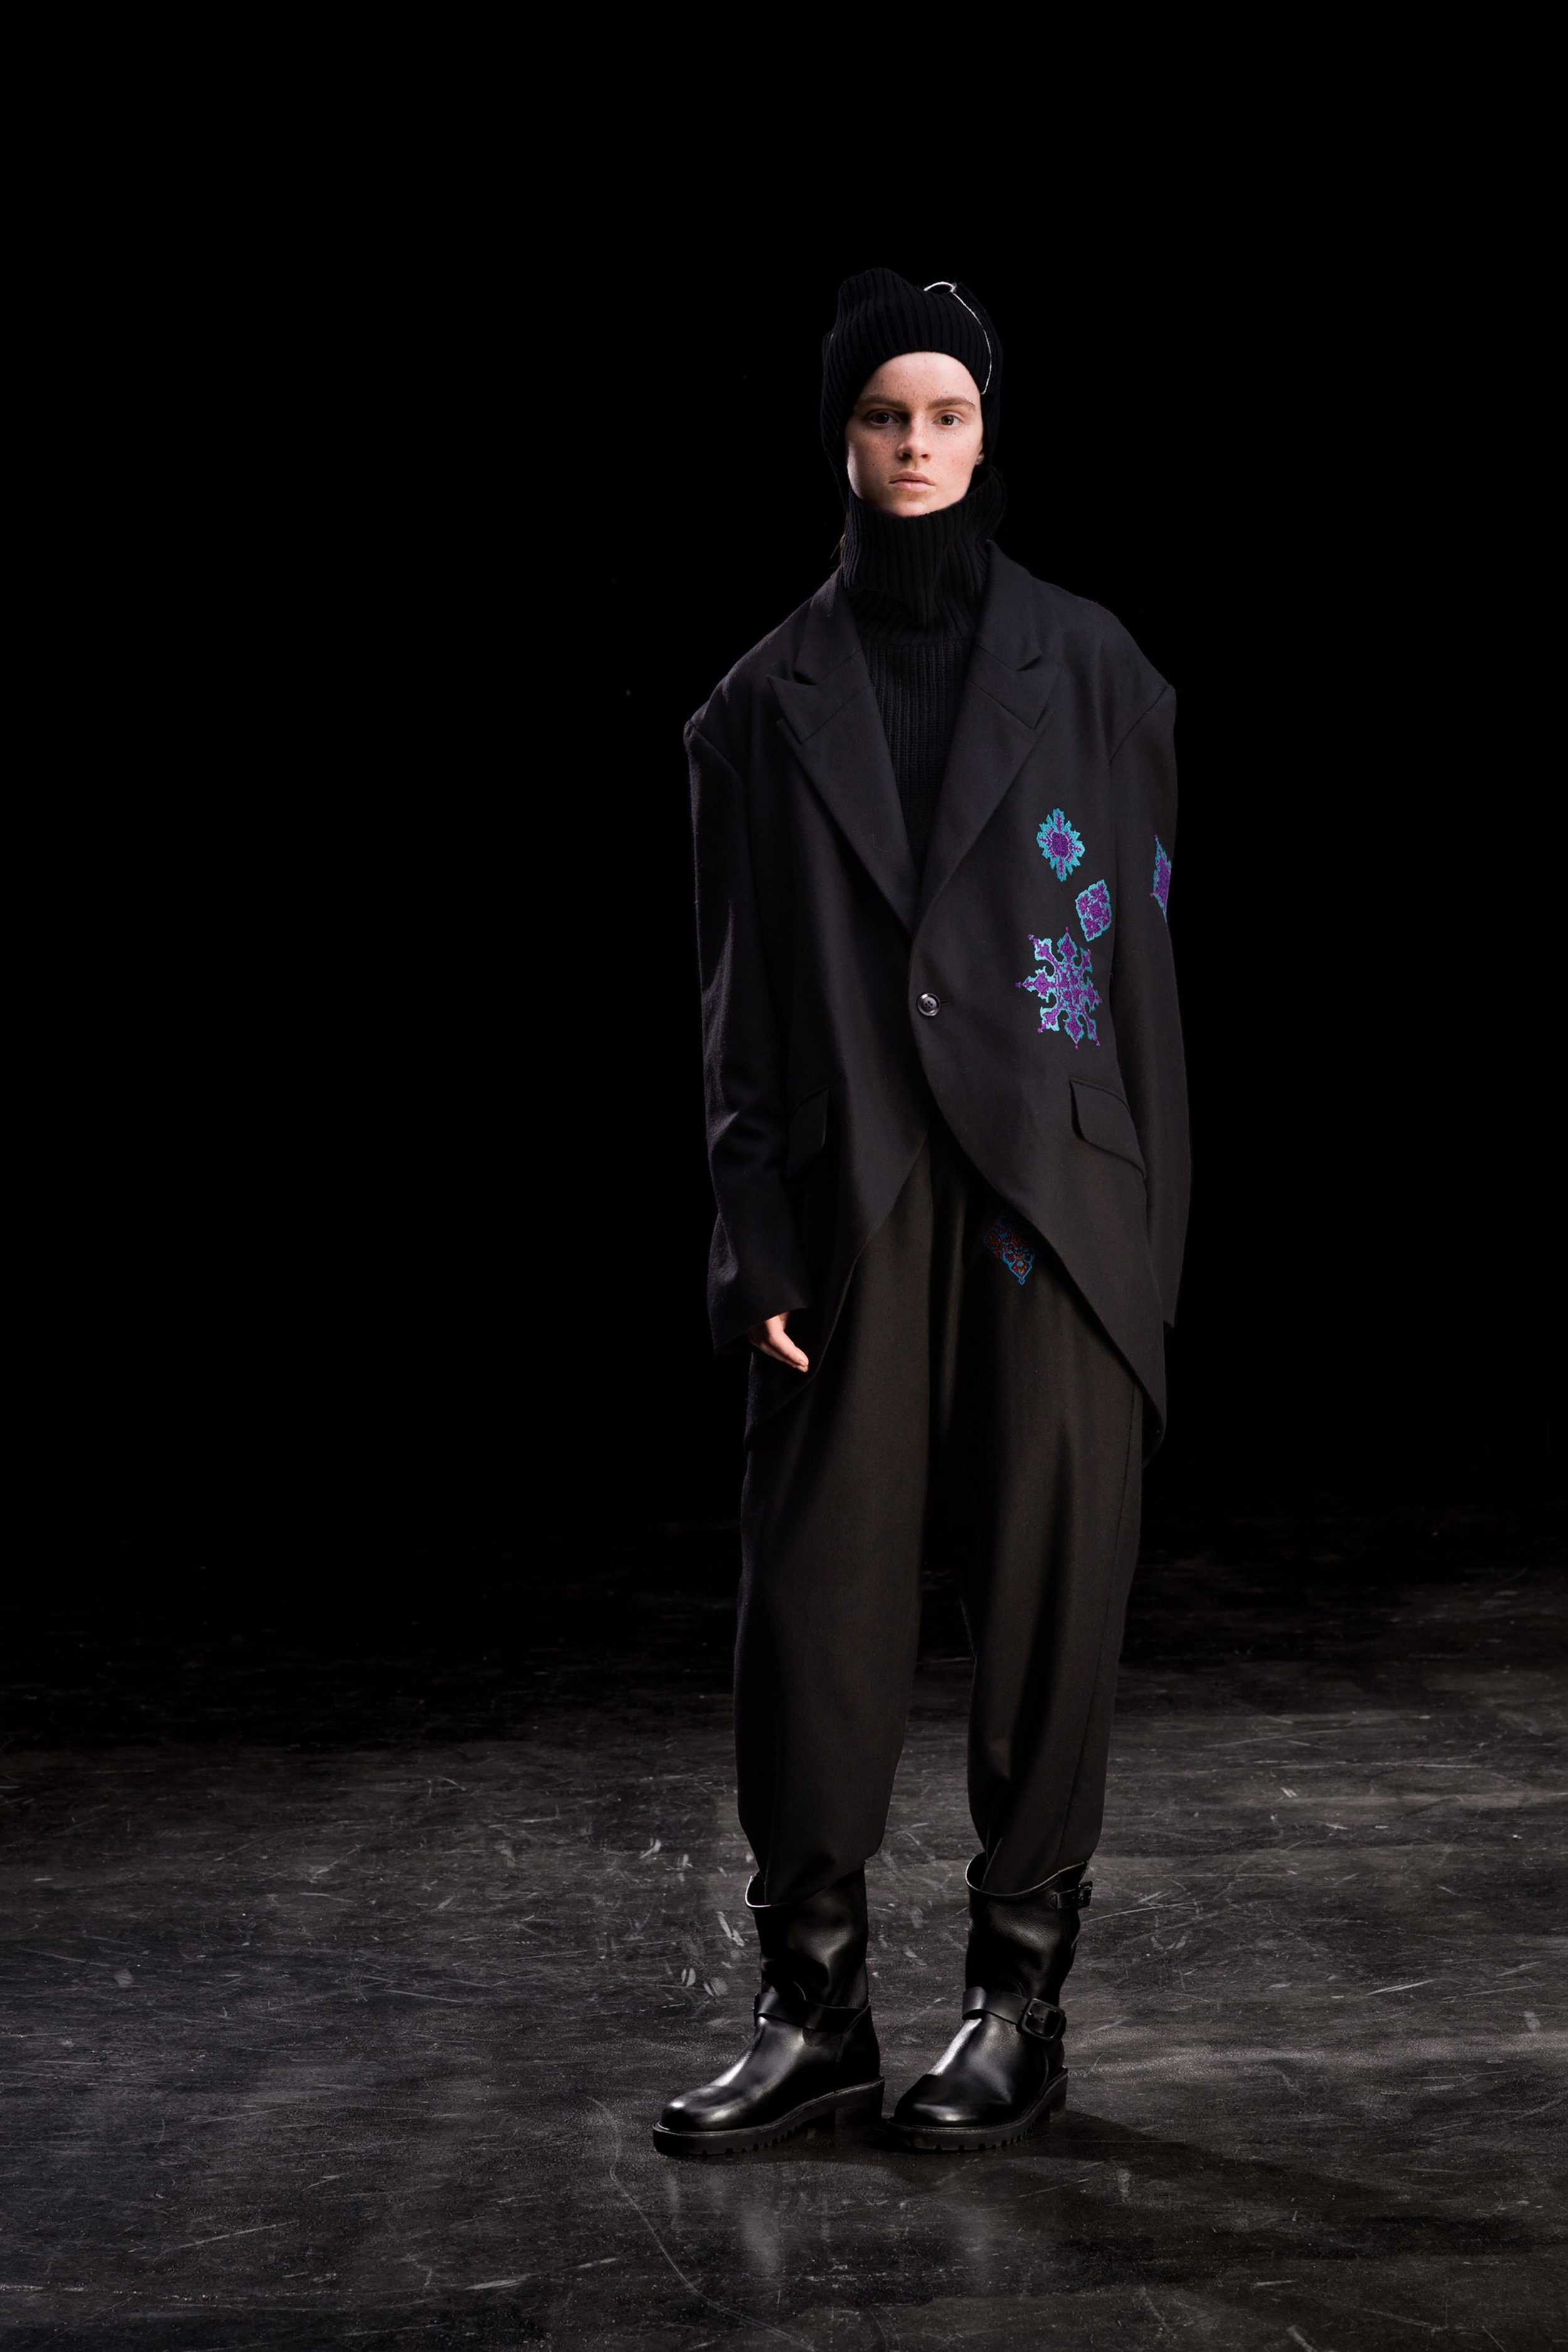 00031-Ys-Yohji-Yamamoto-FALL-19-Ready-To-Wear.jpg